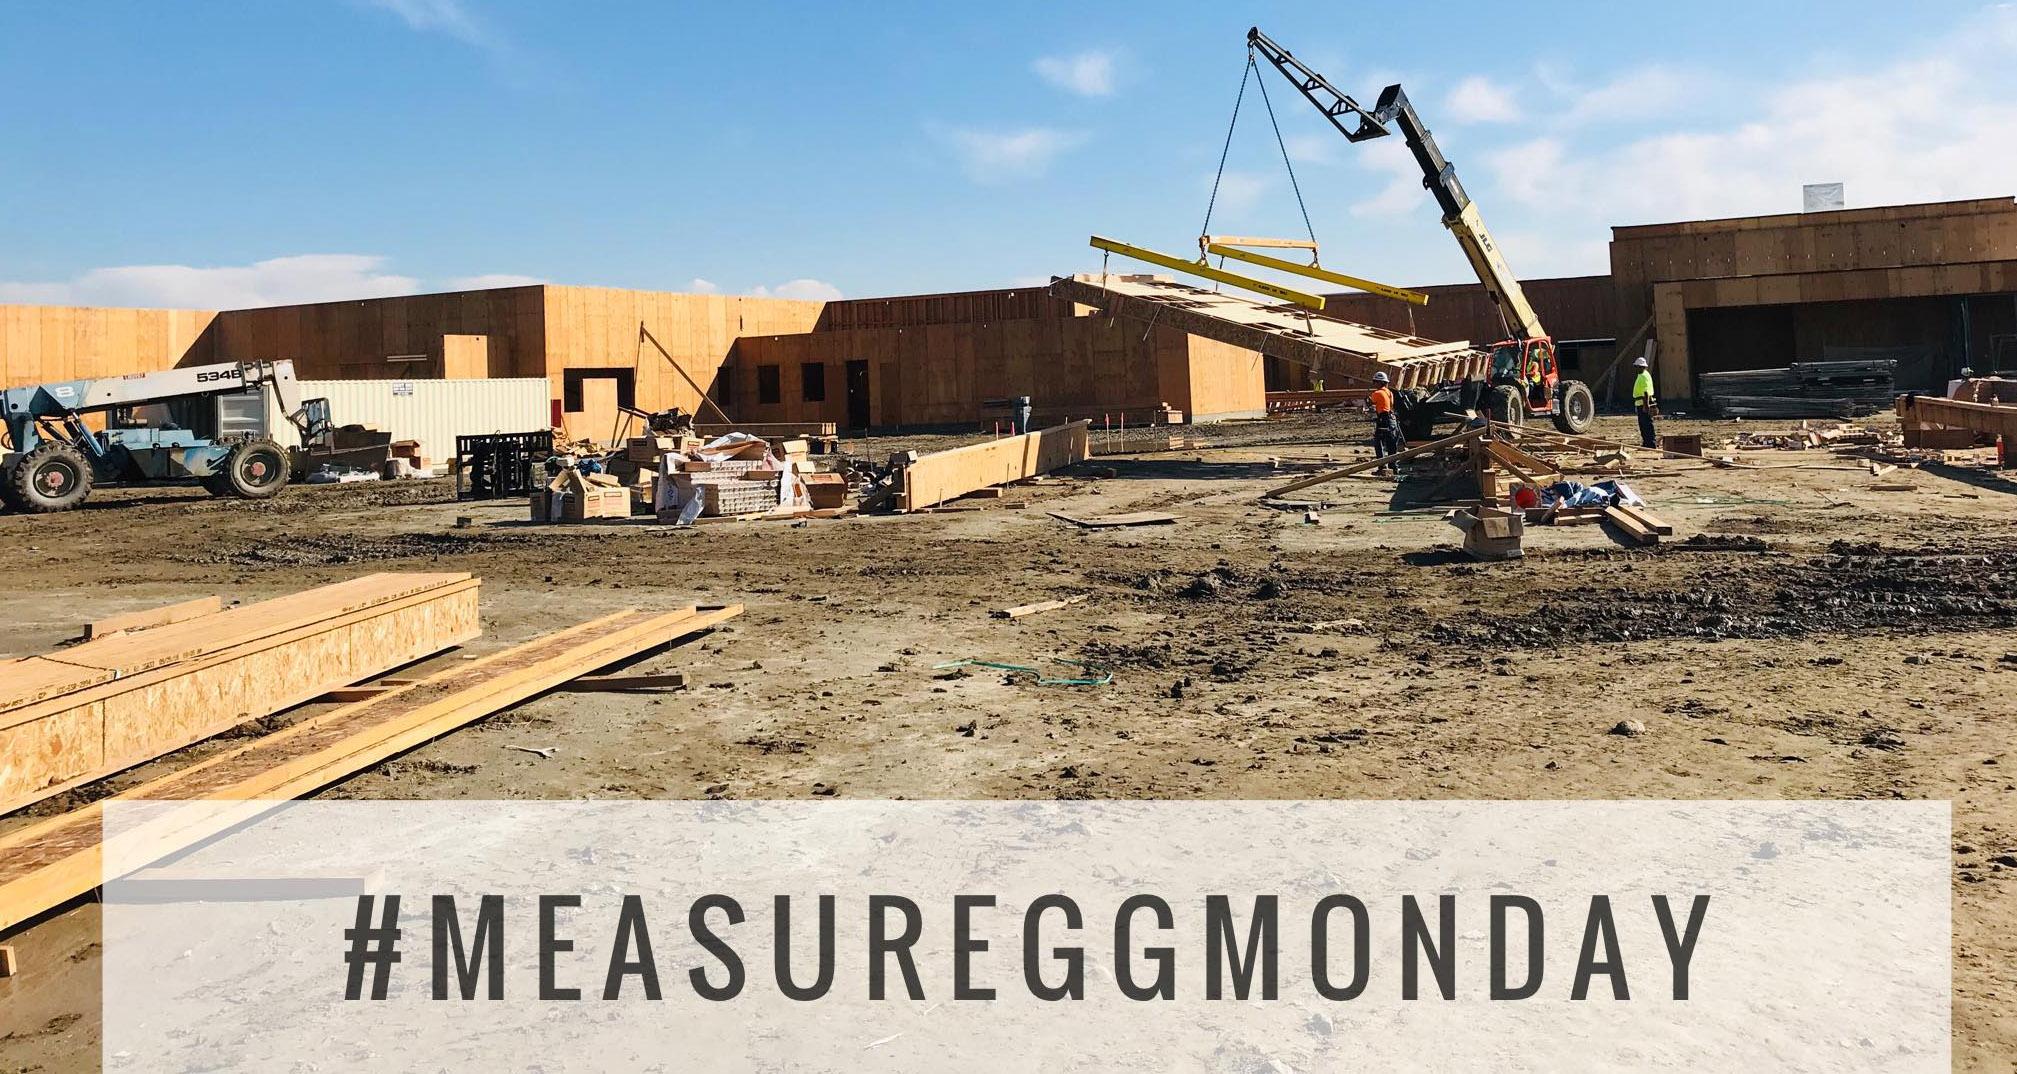 #MeasureGGMonday